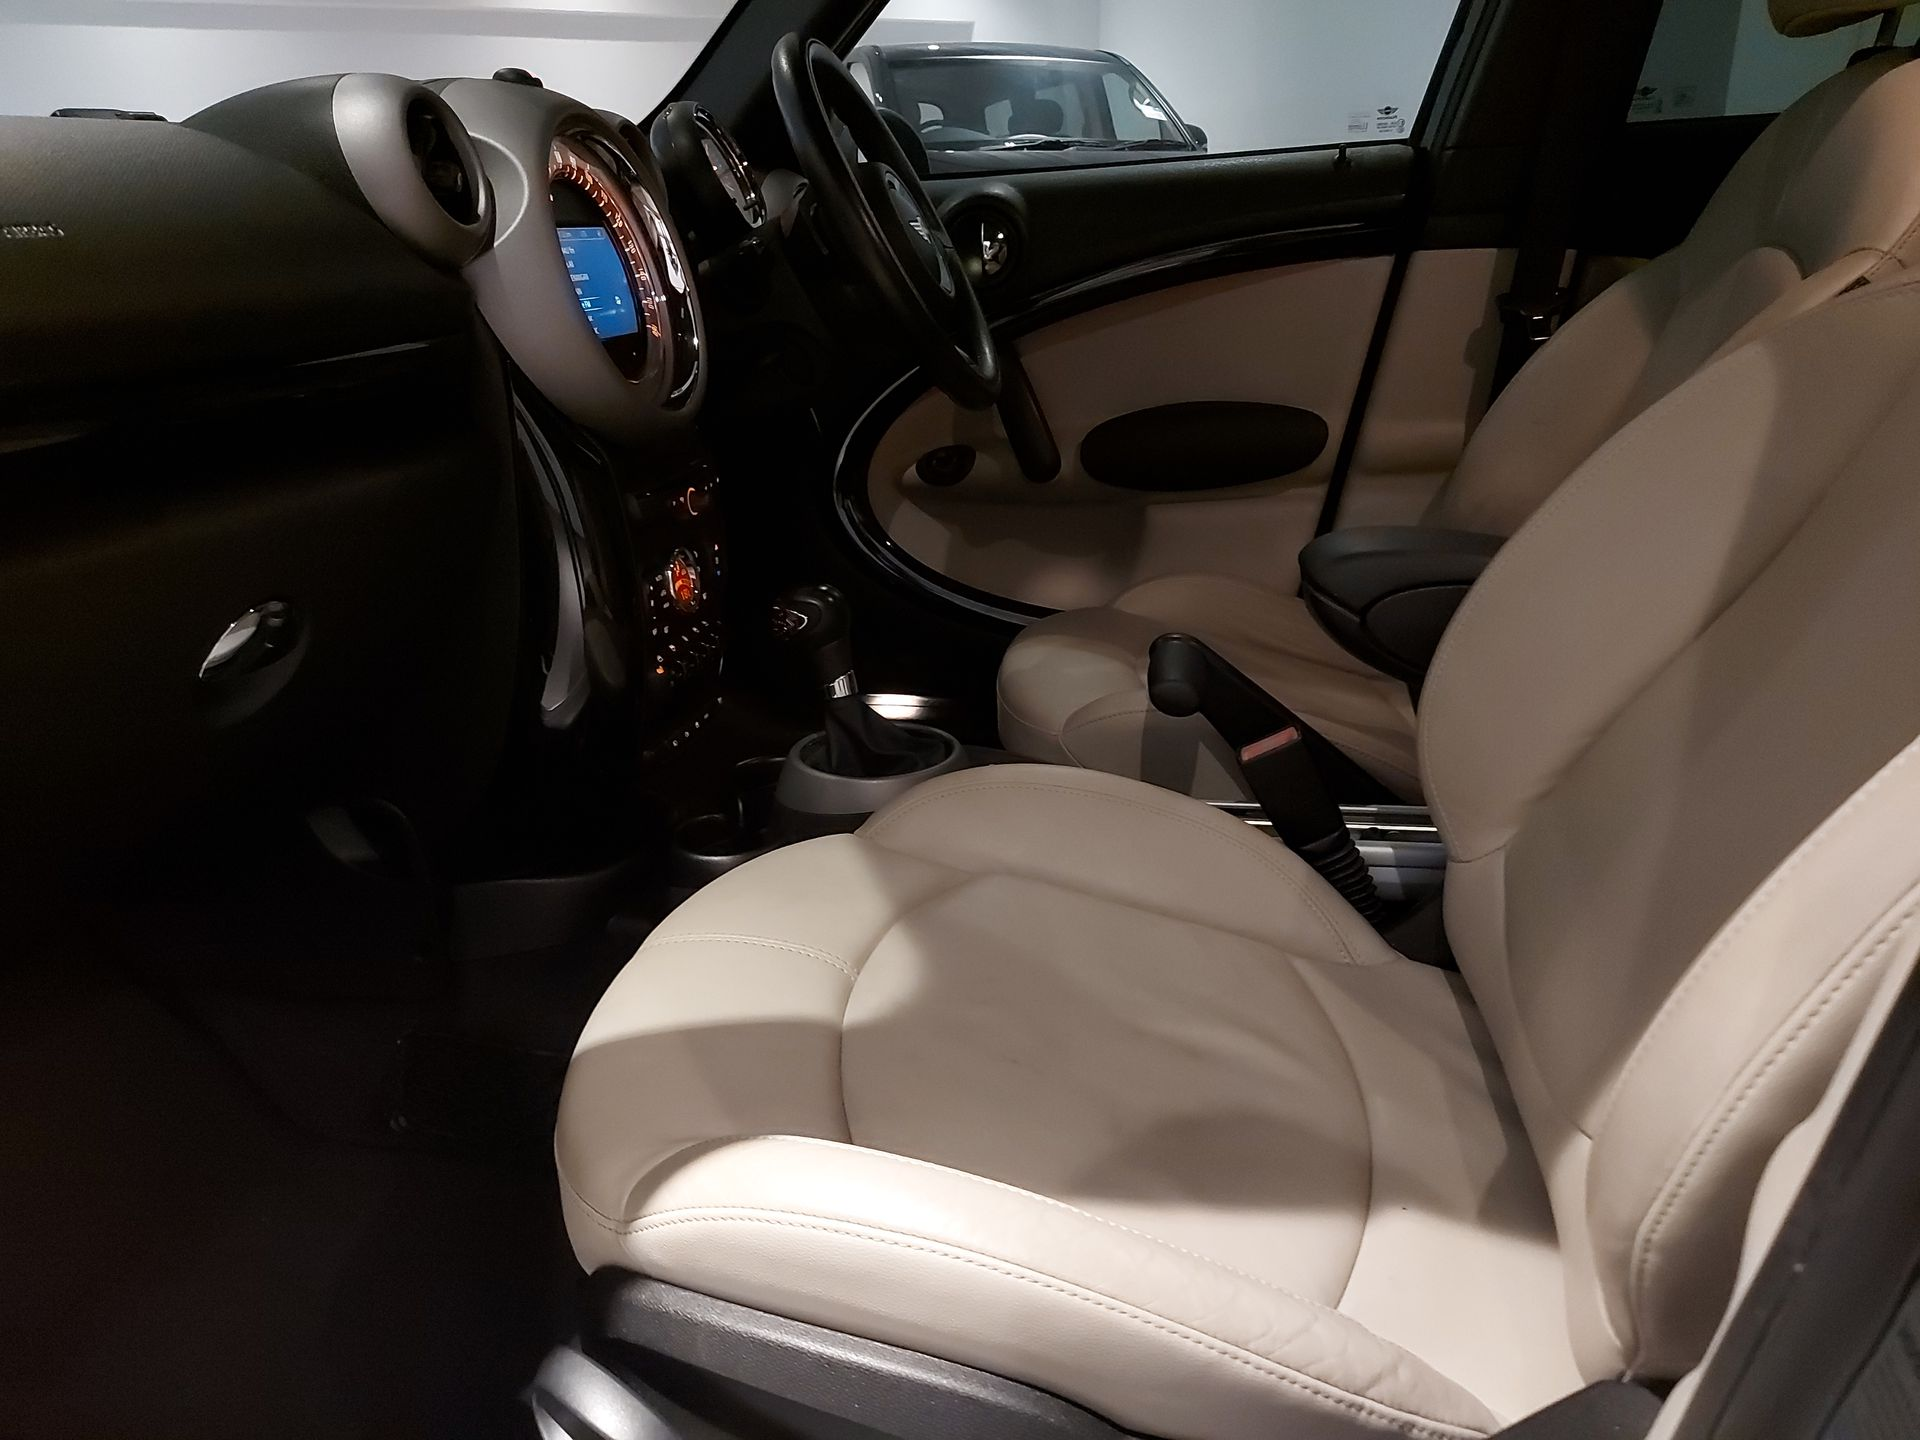 2012 MINI R60/Cooper S (N18) Countryman